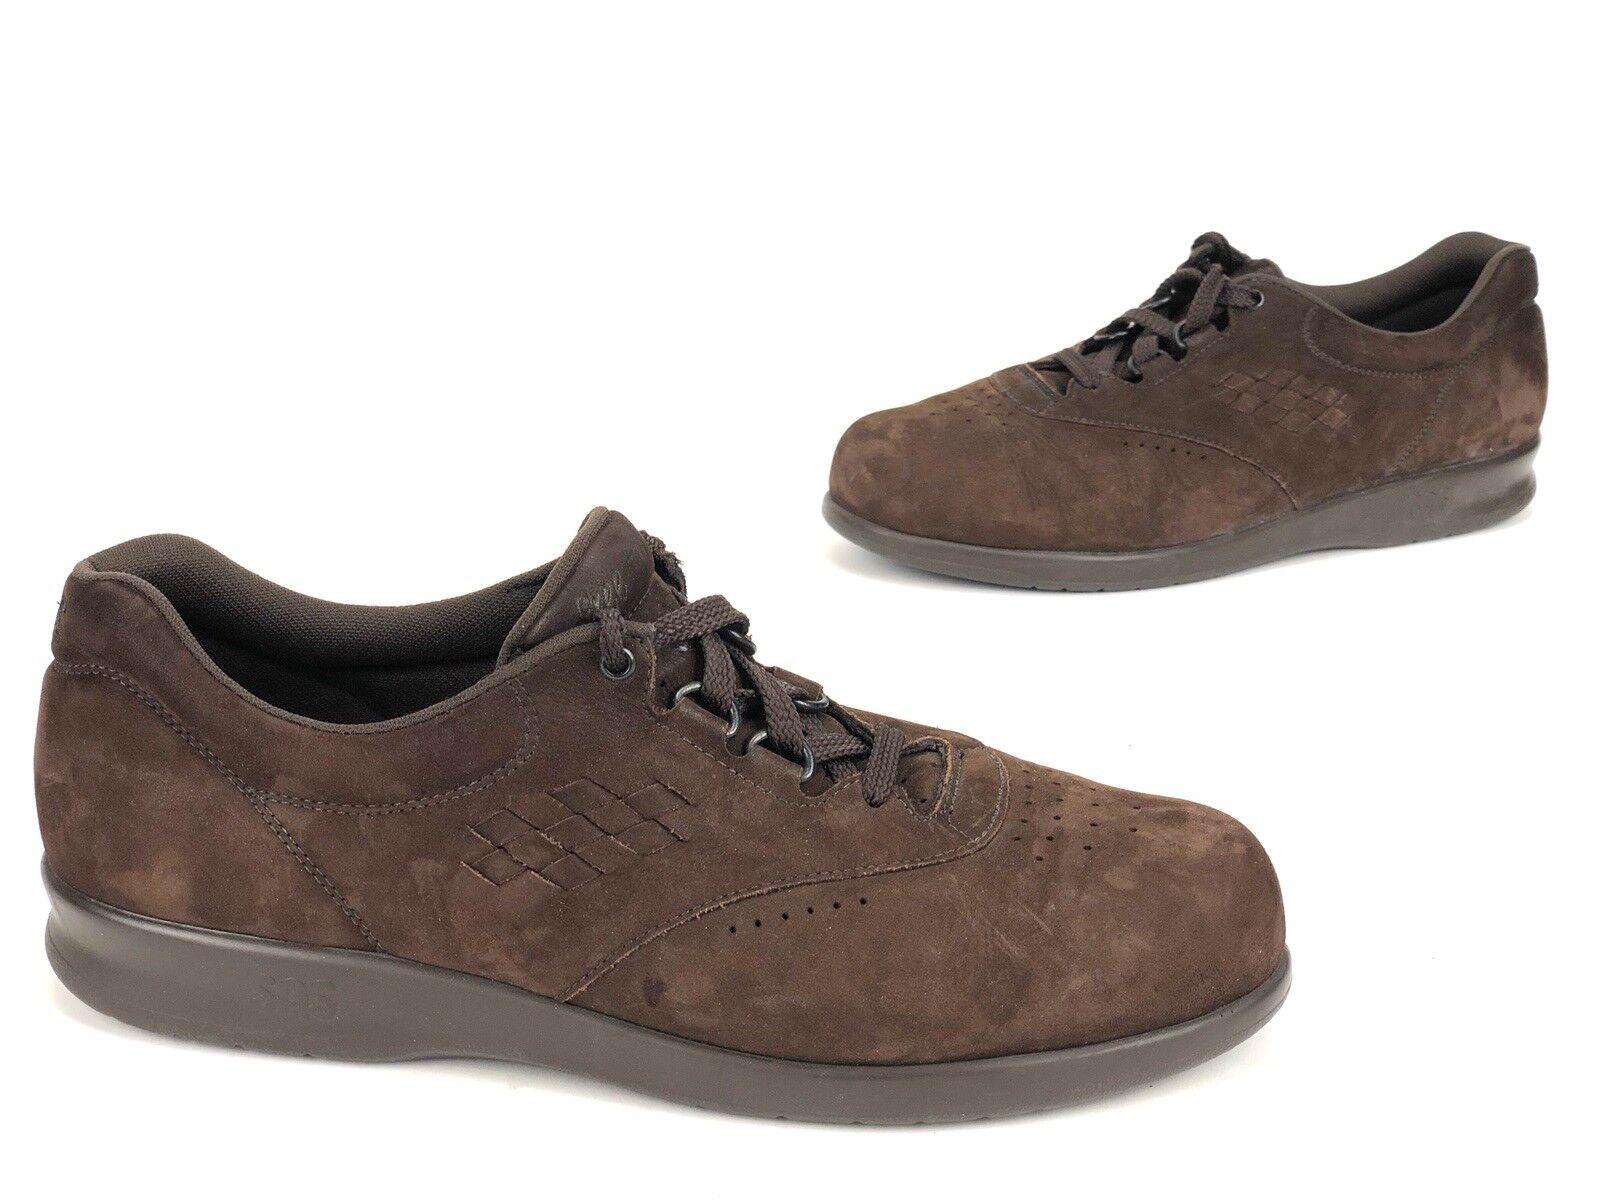 Women's SAS Free Time Dark Brown Suede Comfort shoes Sz 10 Tripad Comfort